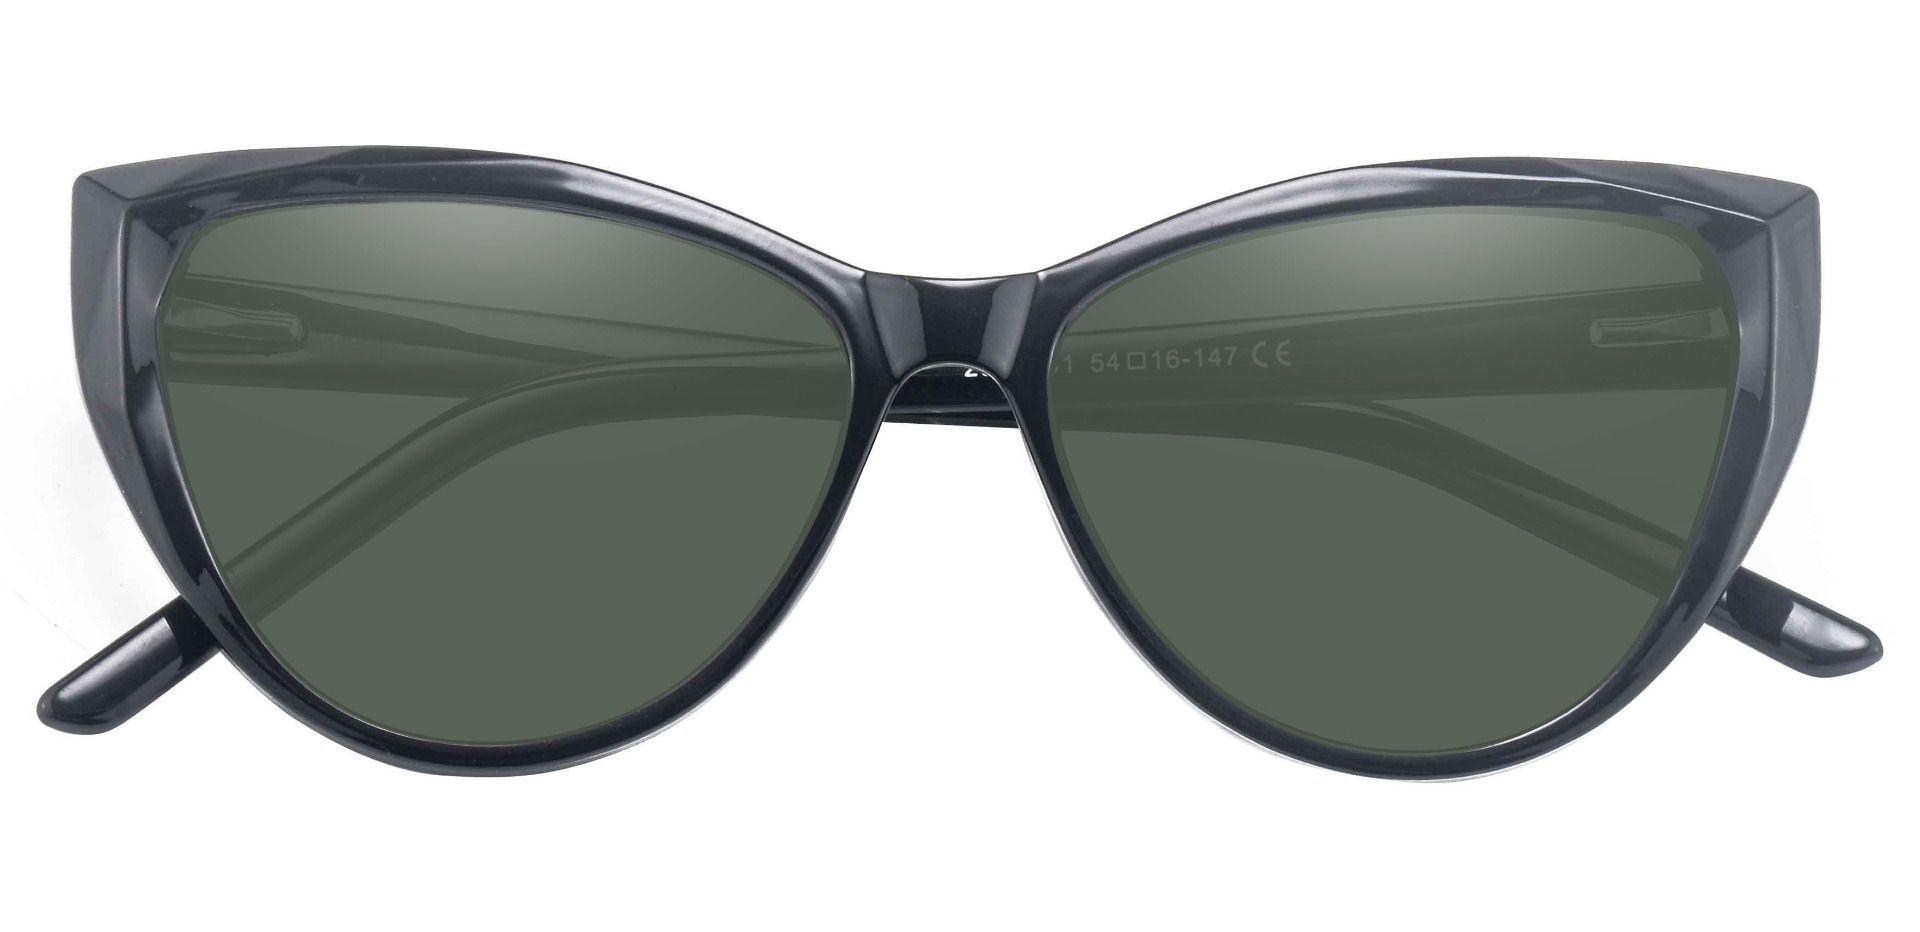 Ireland Cat Eye Lined Bifocal Sunglasses - Black Frame With Green Lenses